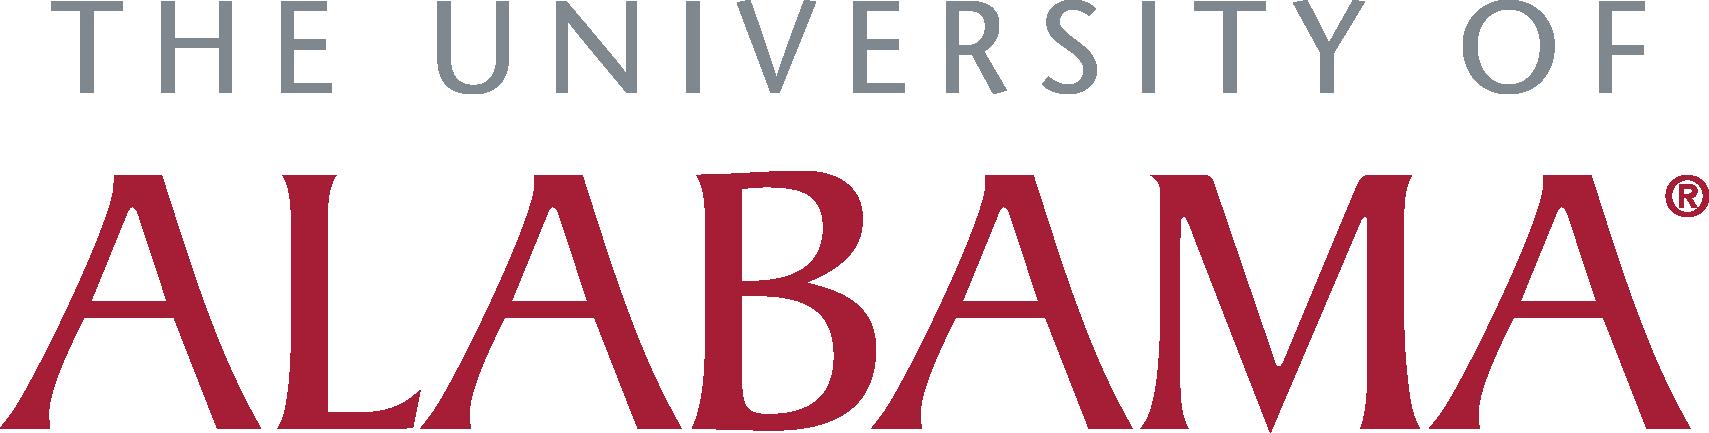 University of Alabama Footer Logo